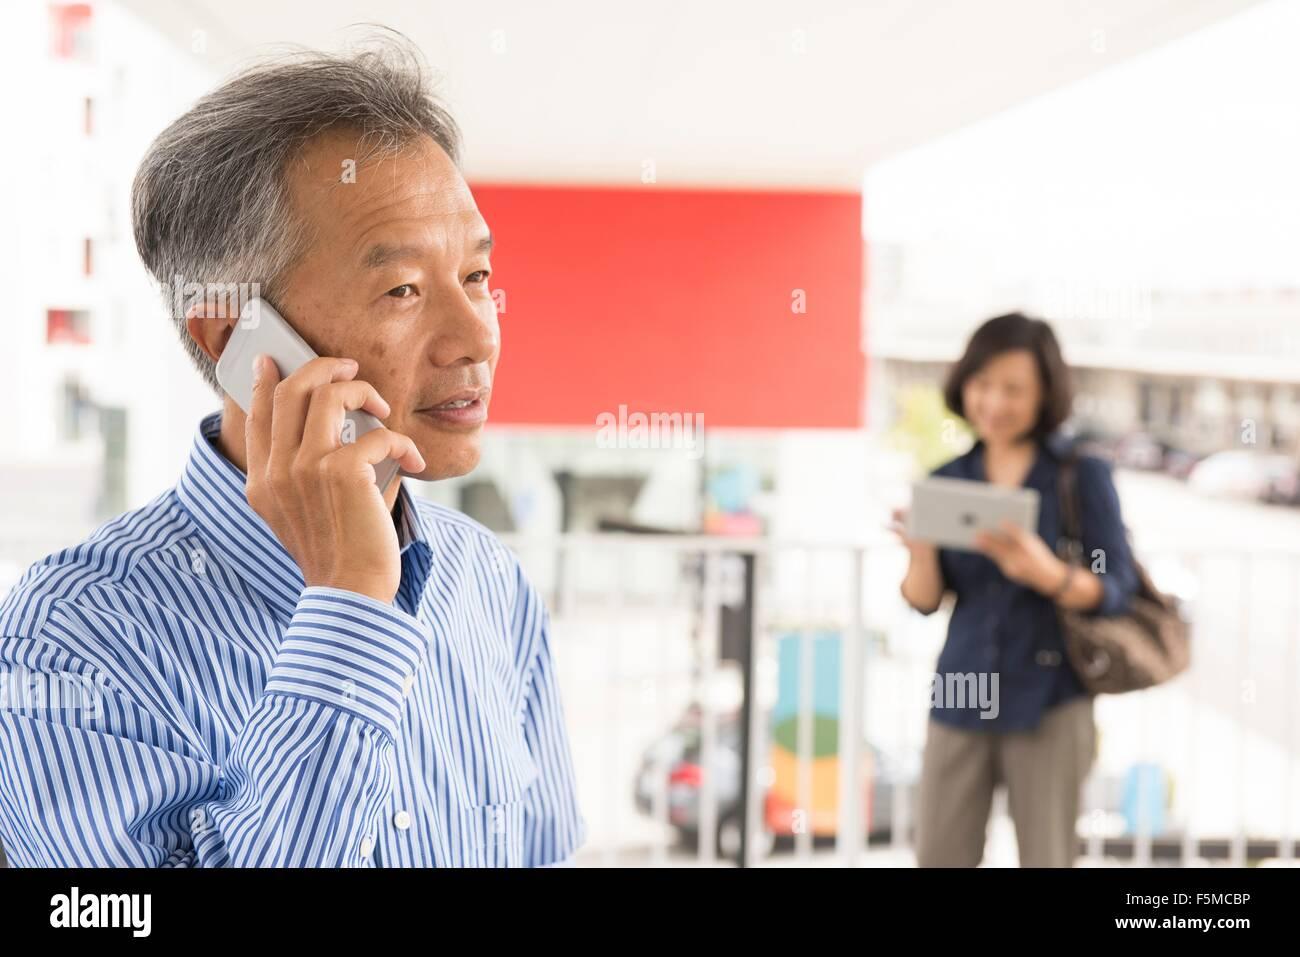 Tête et épaules de man talking on smartphone looking away Photo Stock